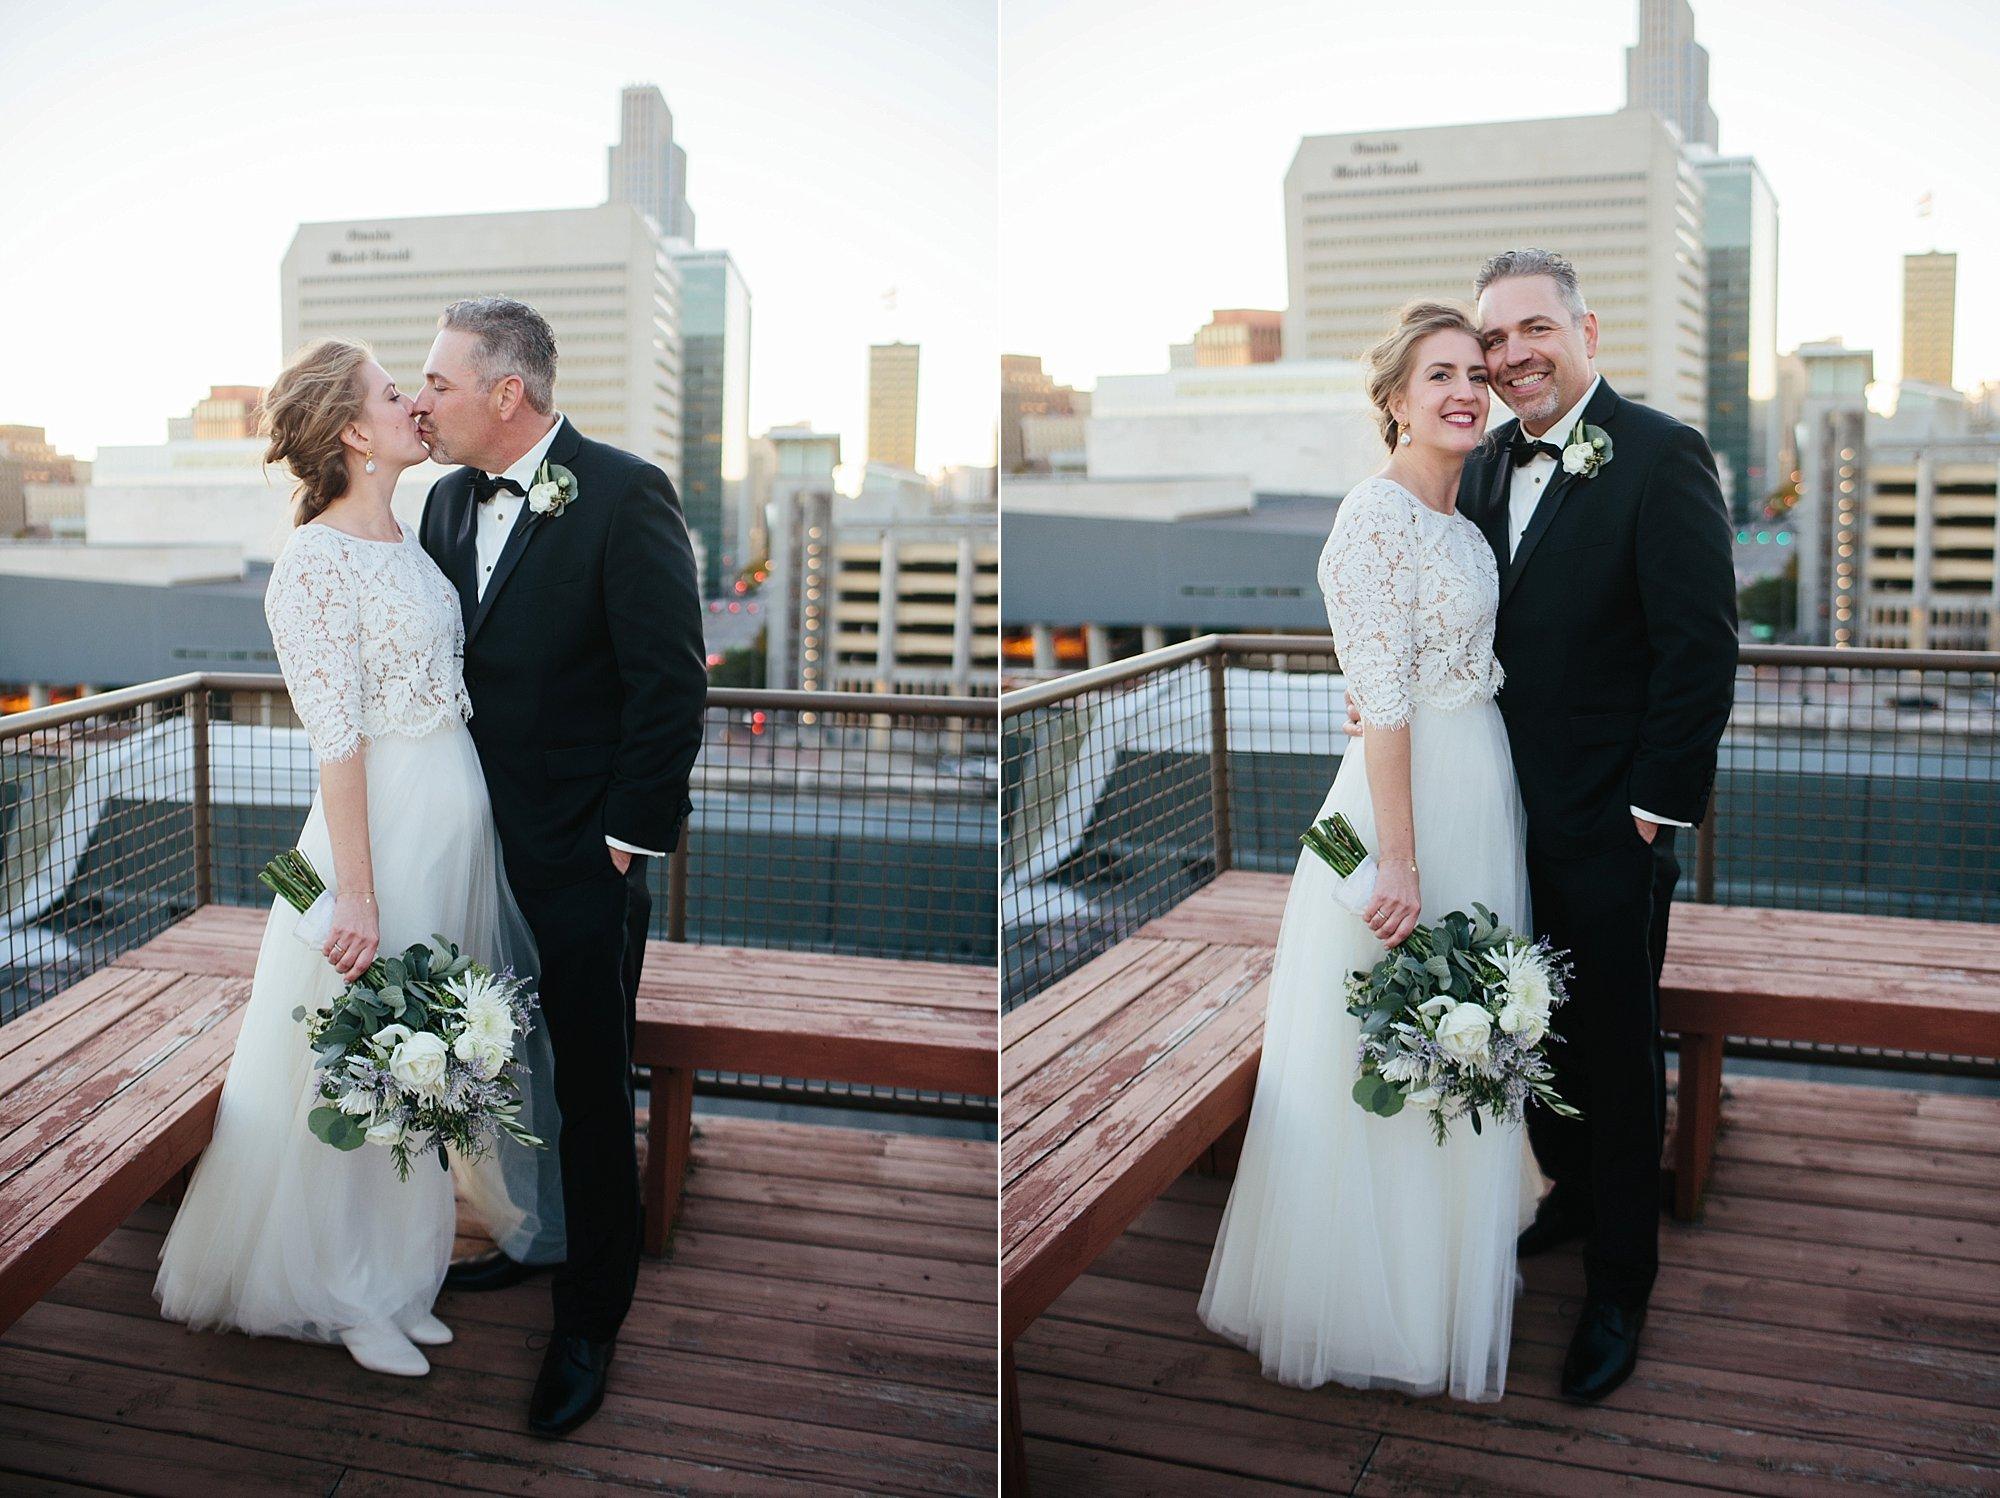 Jenna Amp Jeff Married Omaha Nebraska The Leekers